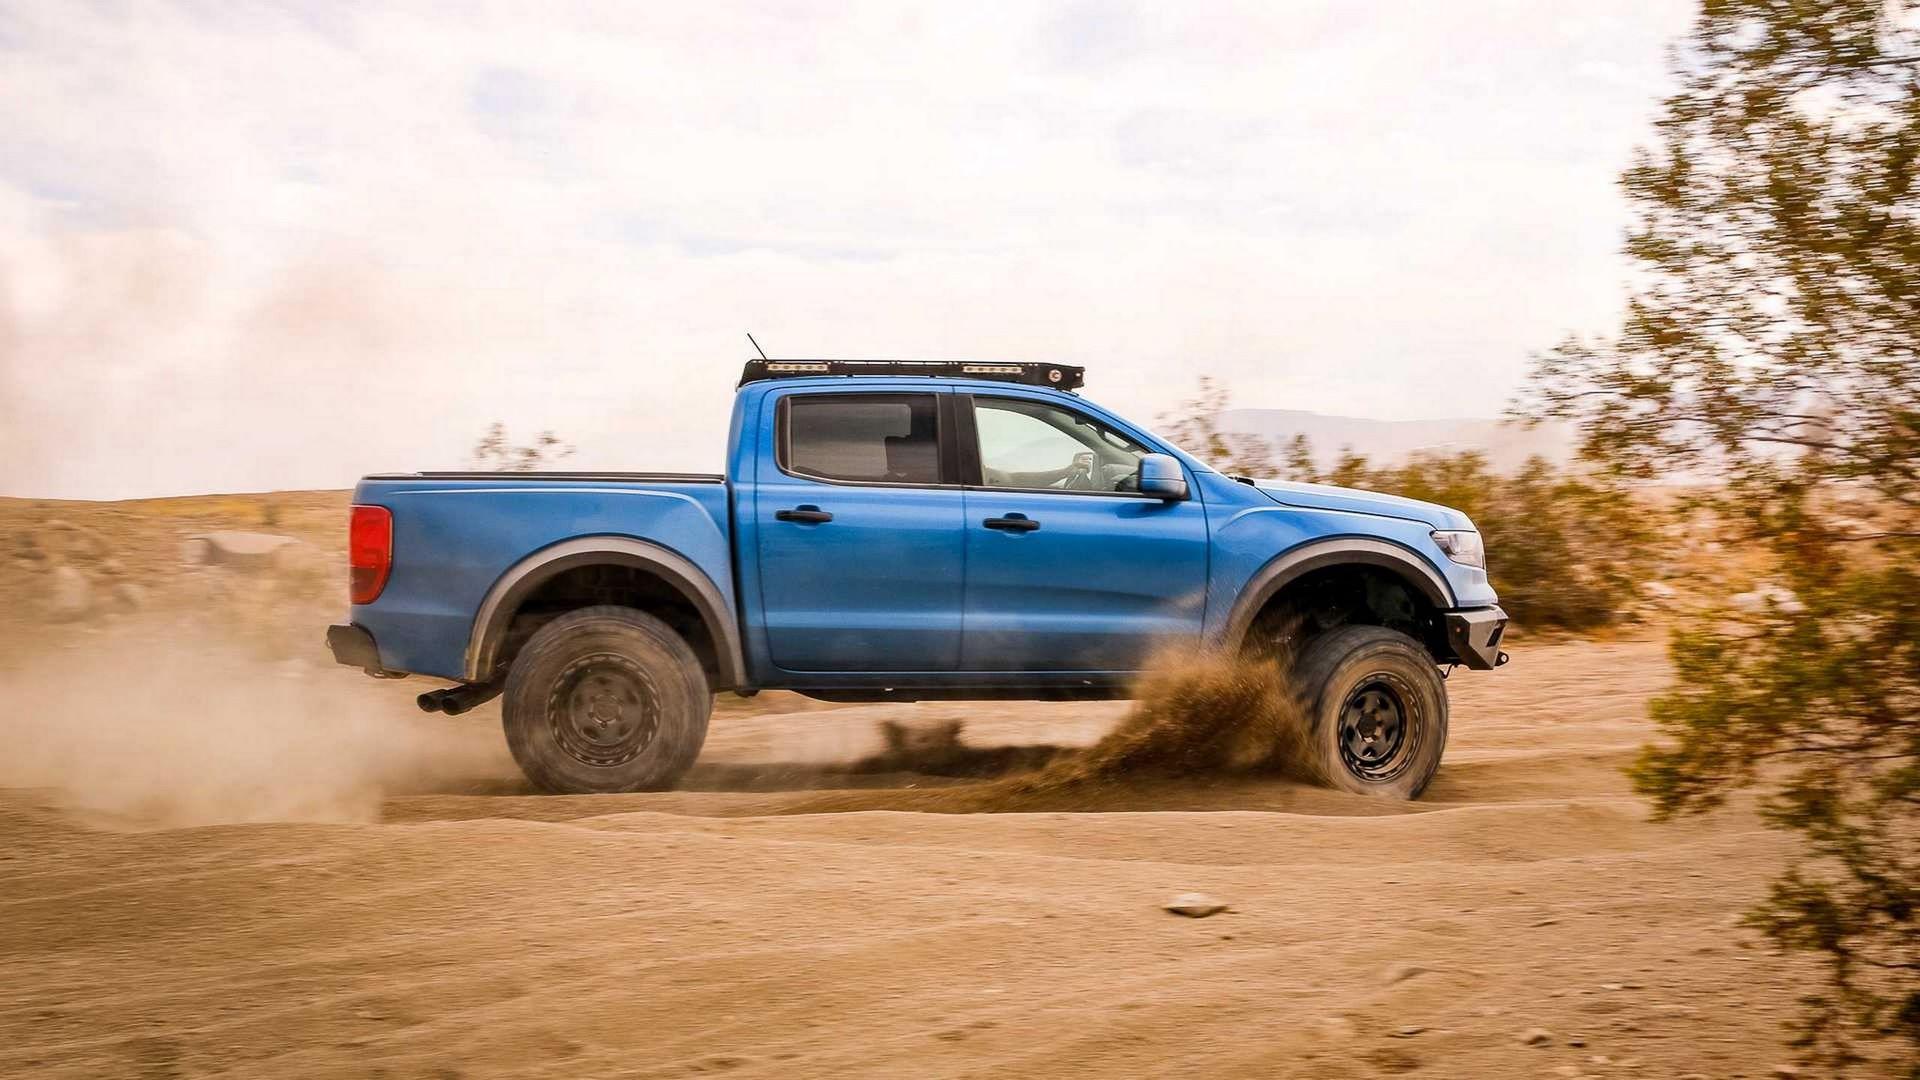 Ford-Ranger-Prorunner-By-APG-15